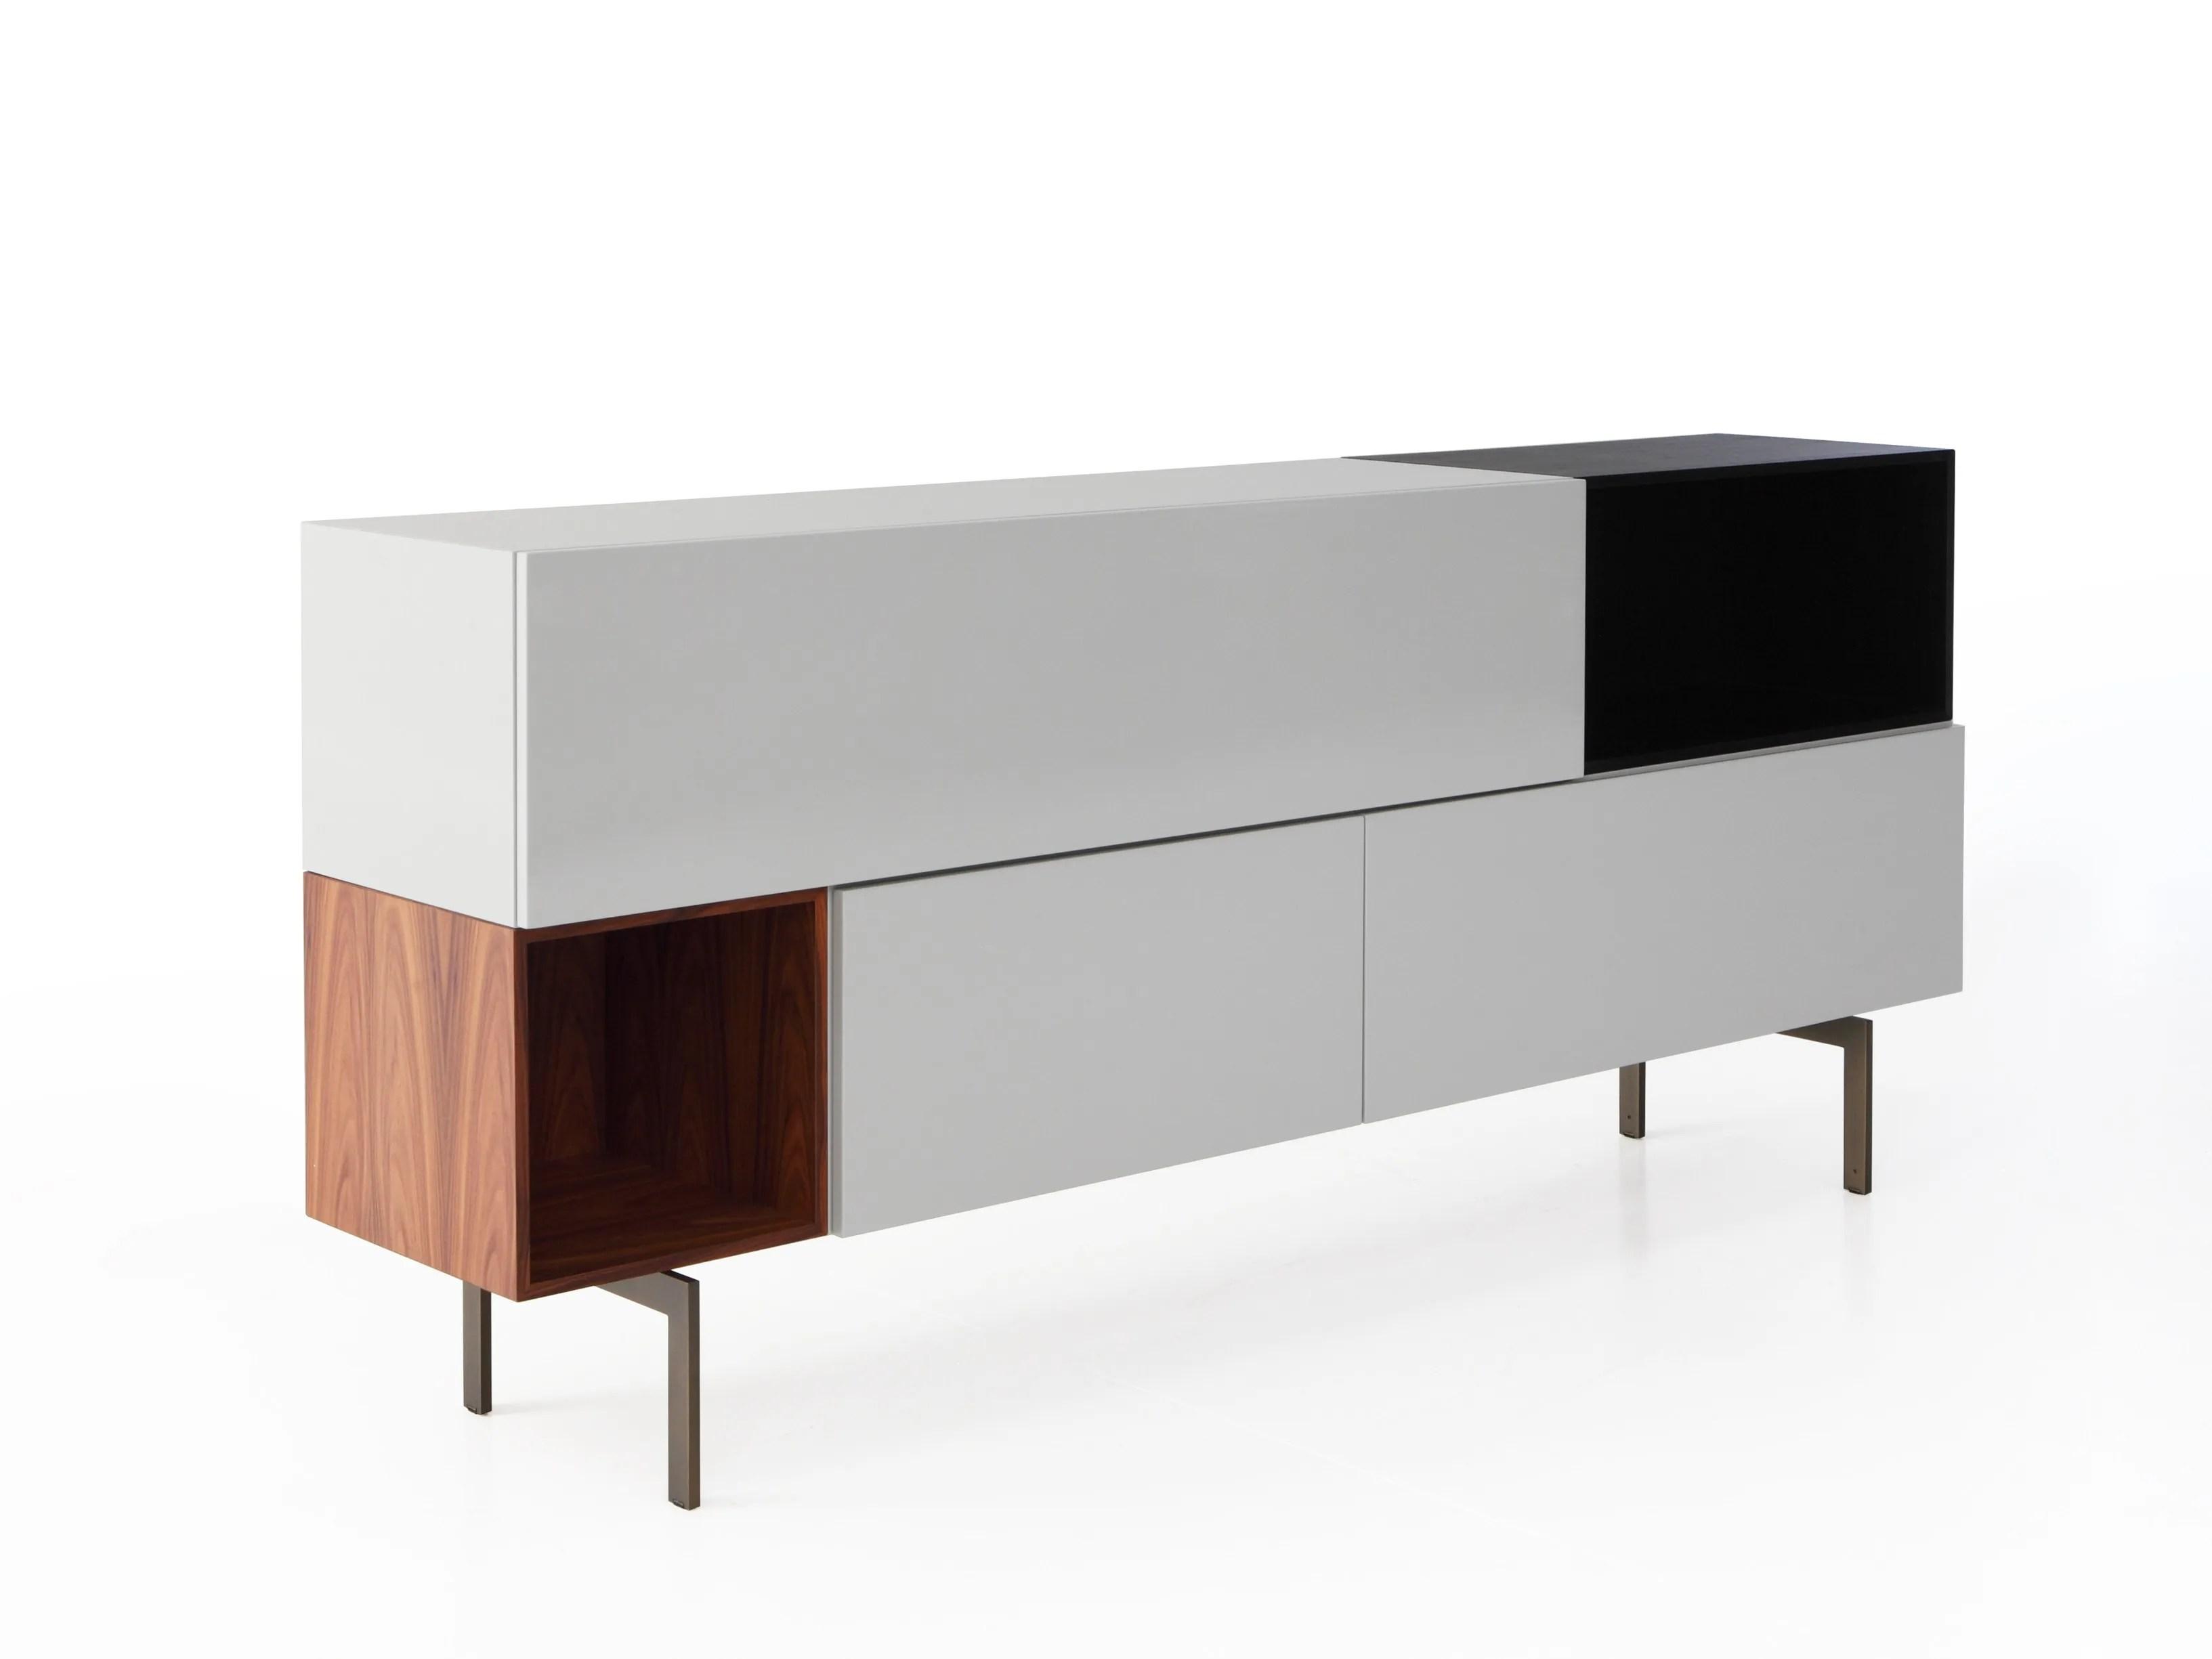 Sideboard Holz Modern Sideboard Holz Modern 13 Deutsche